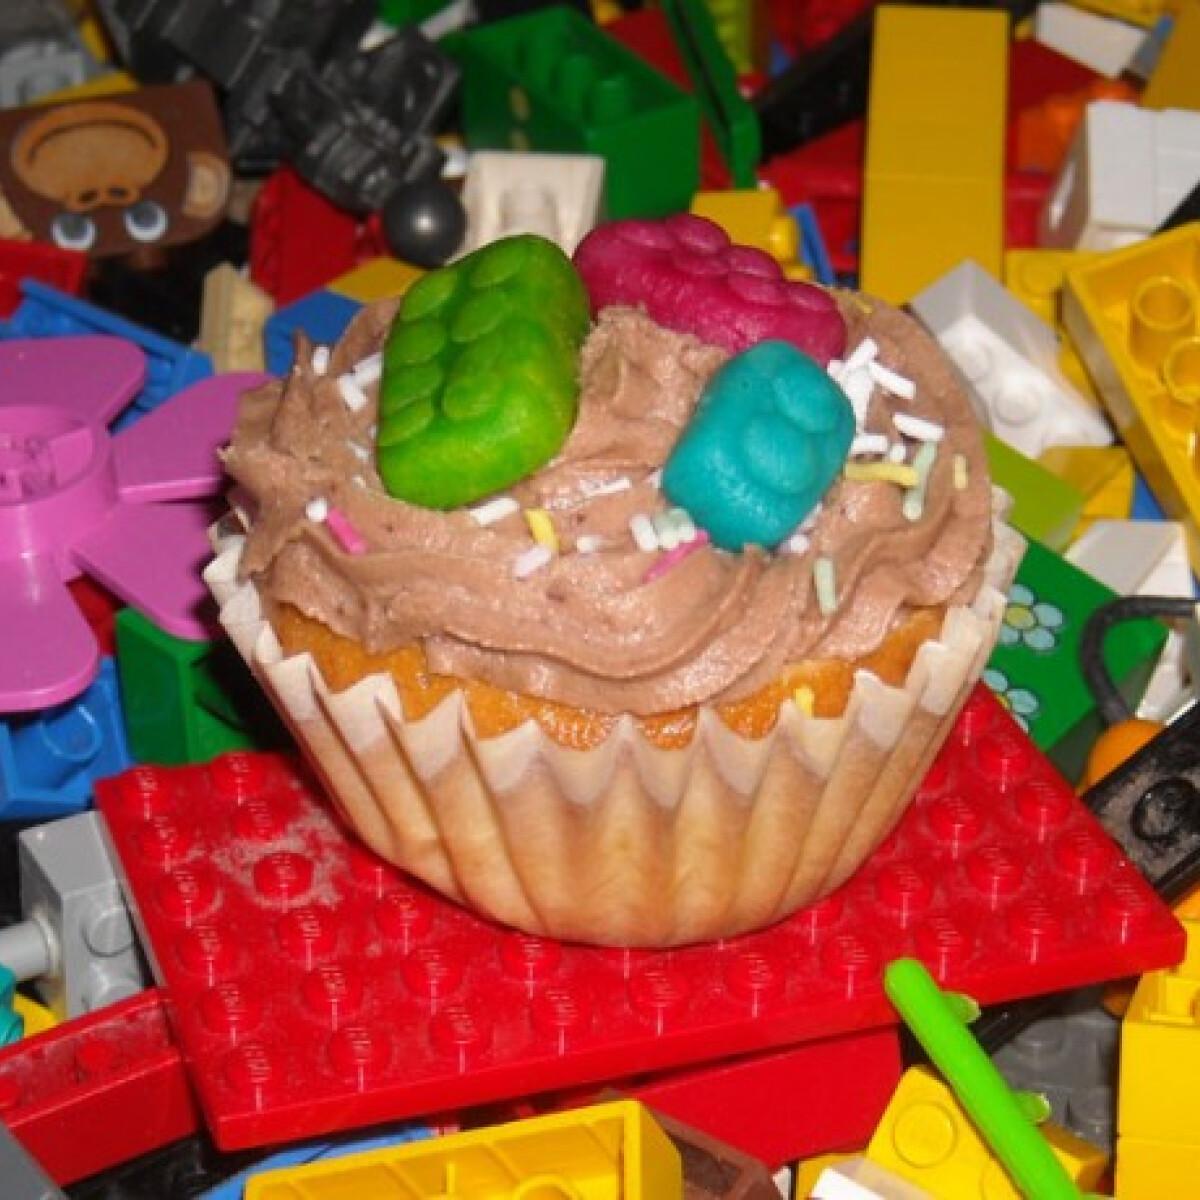 Lego muffin